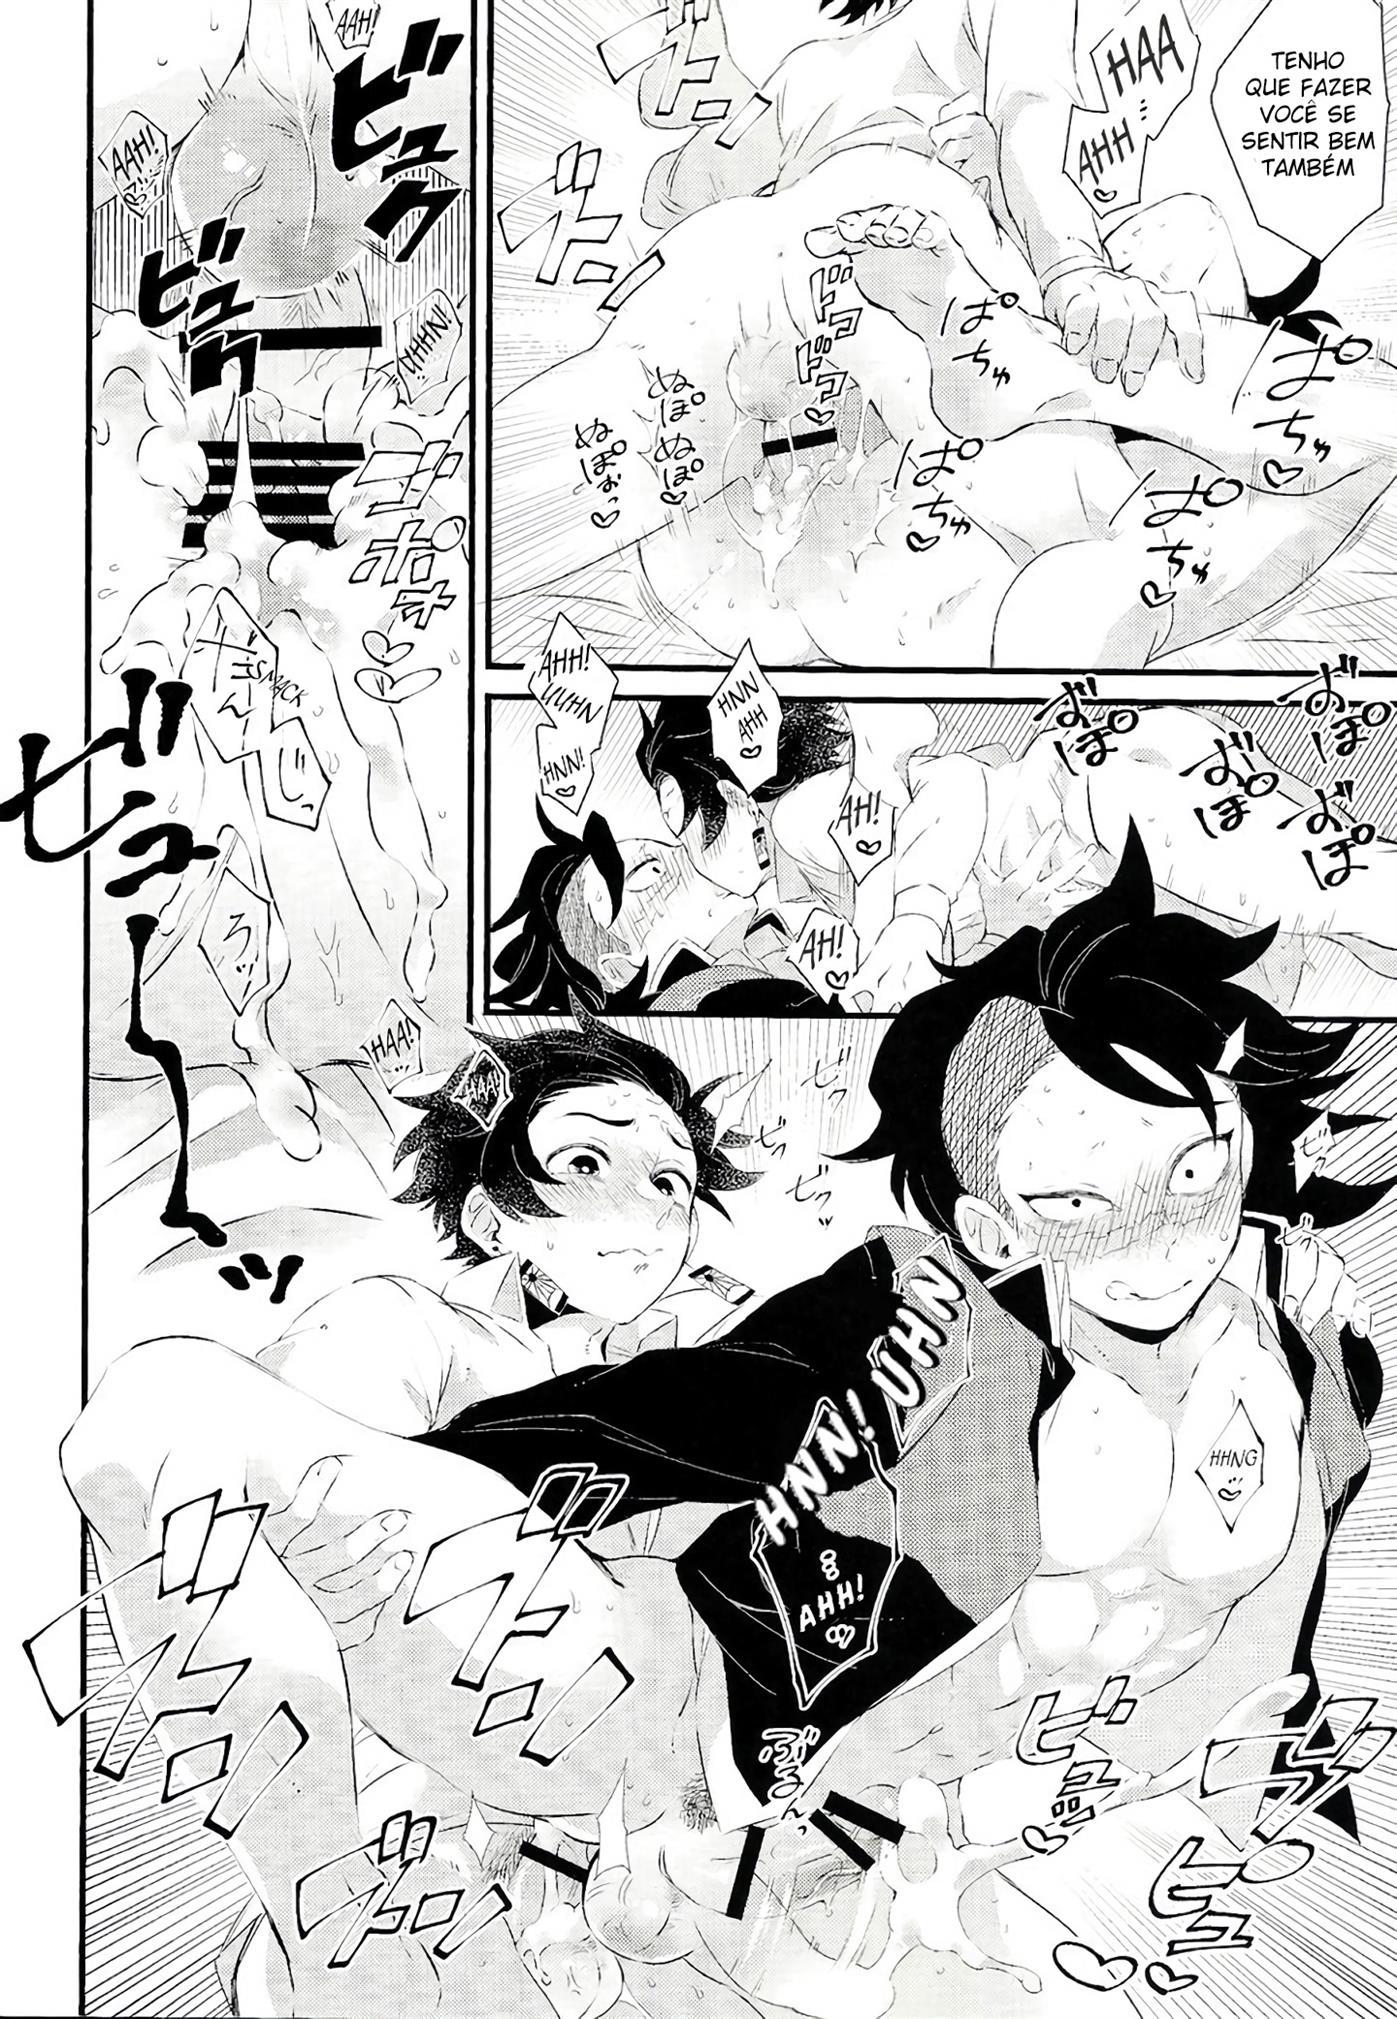 Doujinshi Hentai Gay Demon Slayer - Foto 15